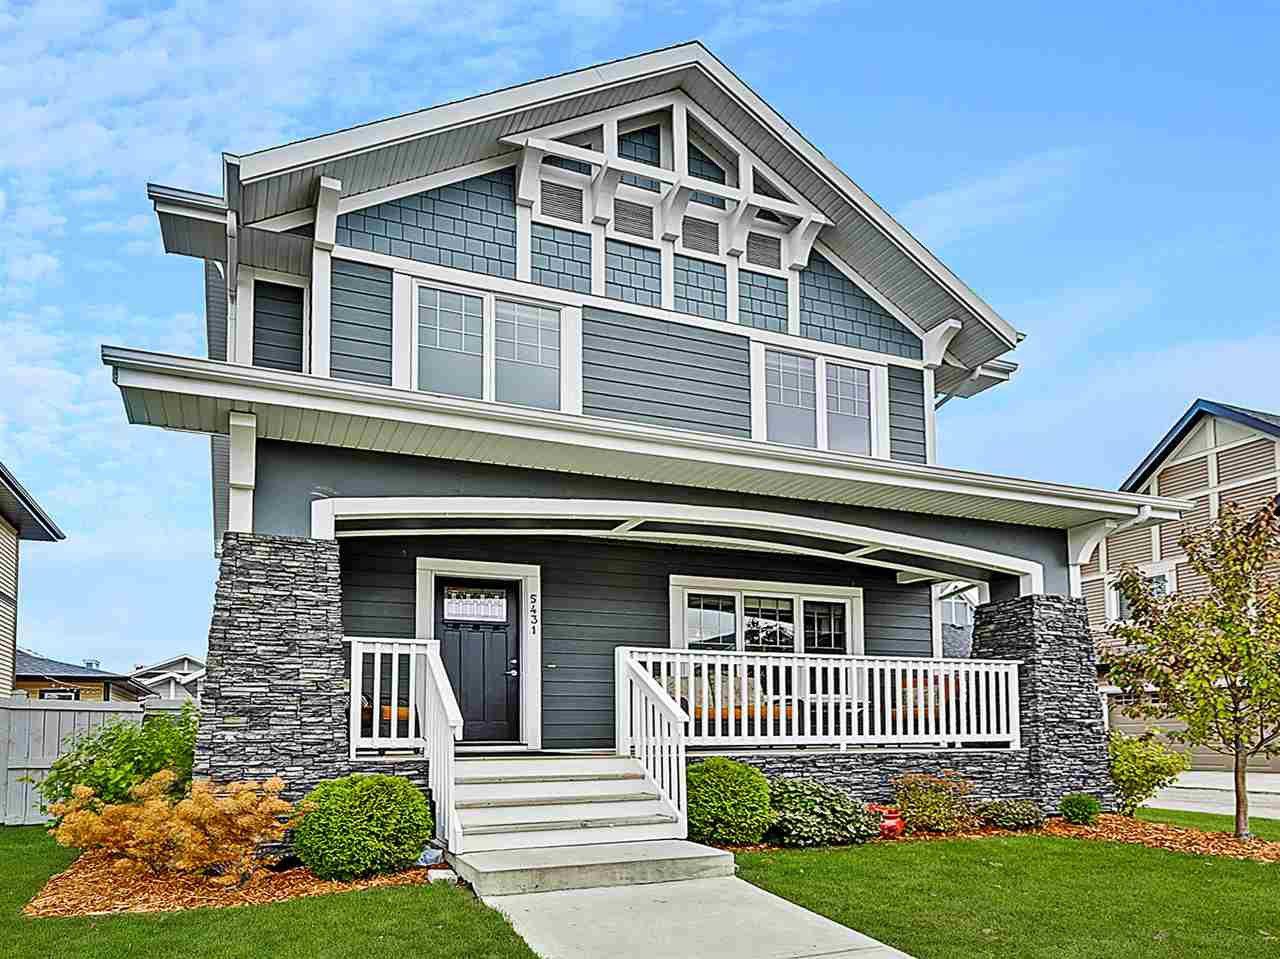 Main Photo: 5431 BONAVENTURE Avenue in Edmonton: Zone 27 House for sale : MLS®# E4177221